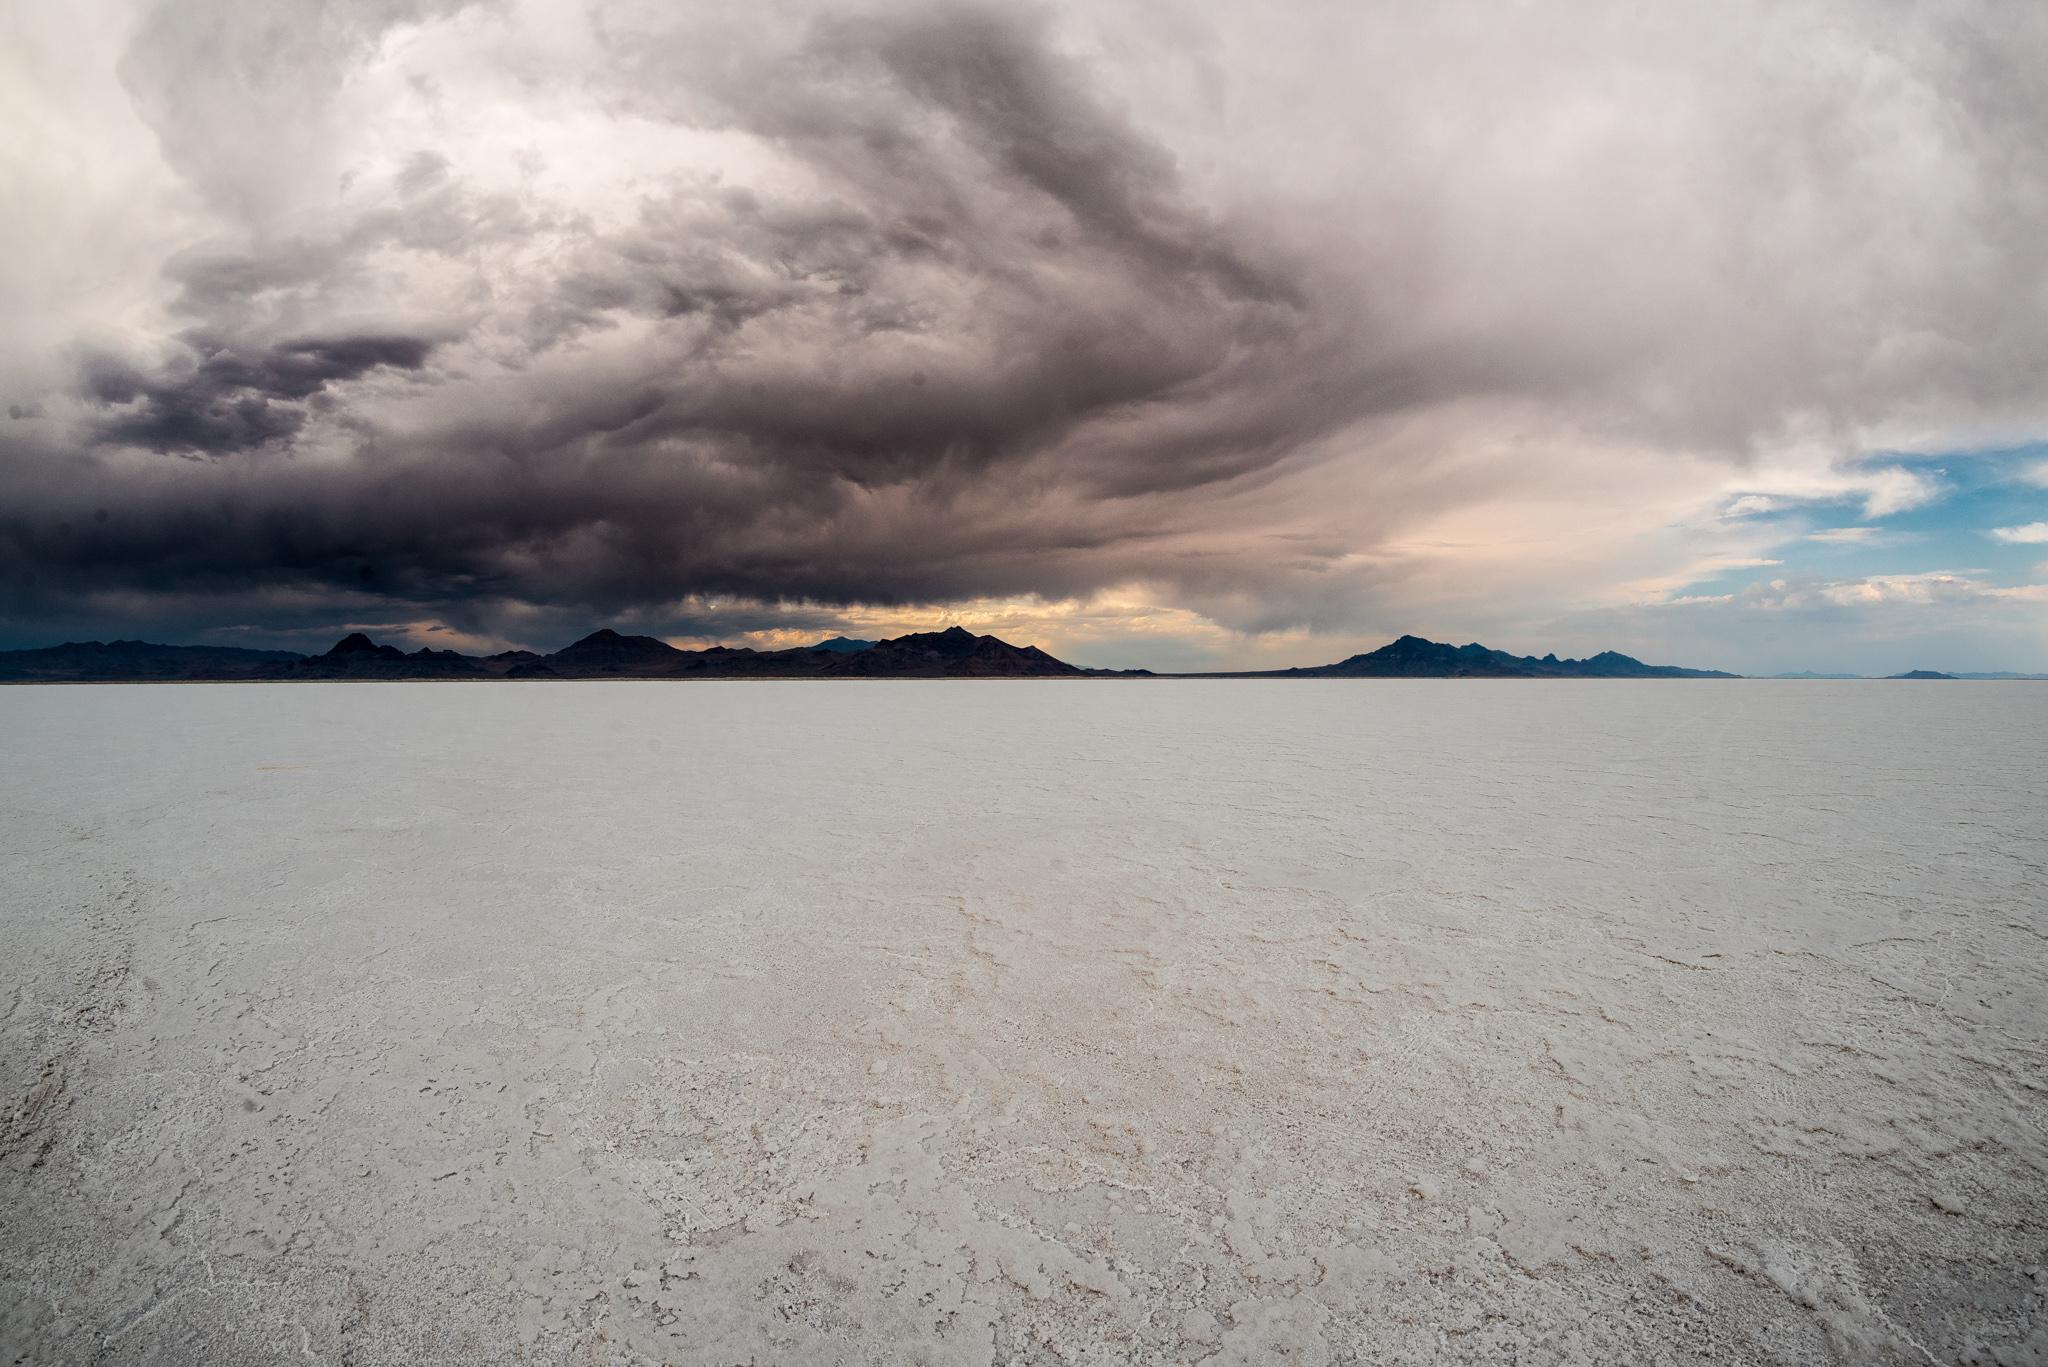 2017-07-08 - Bonneville Salt Flats - 131